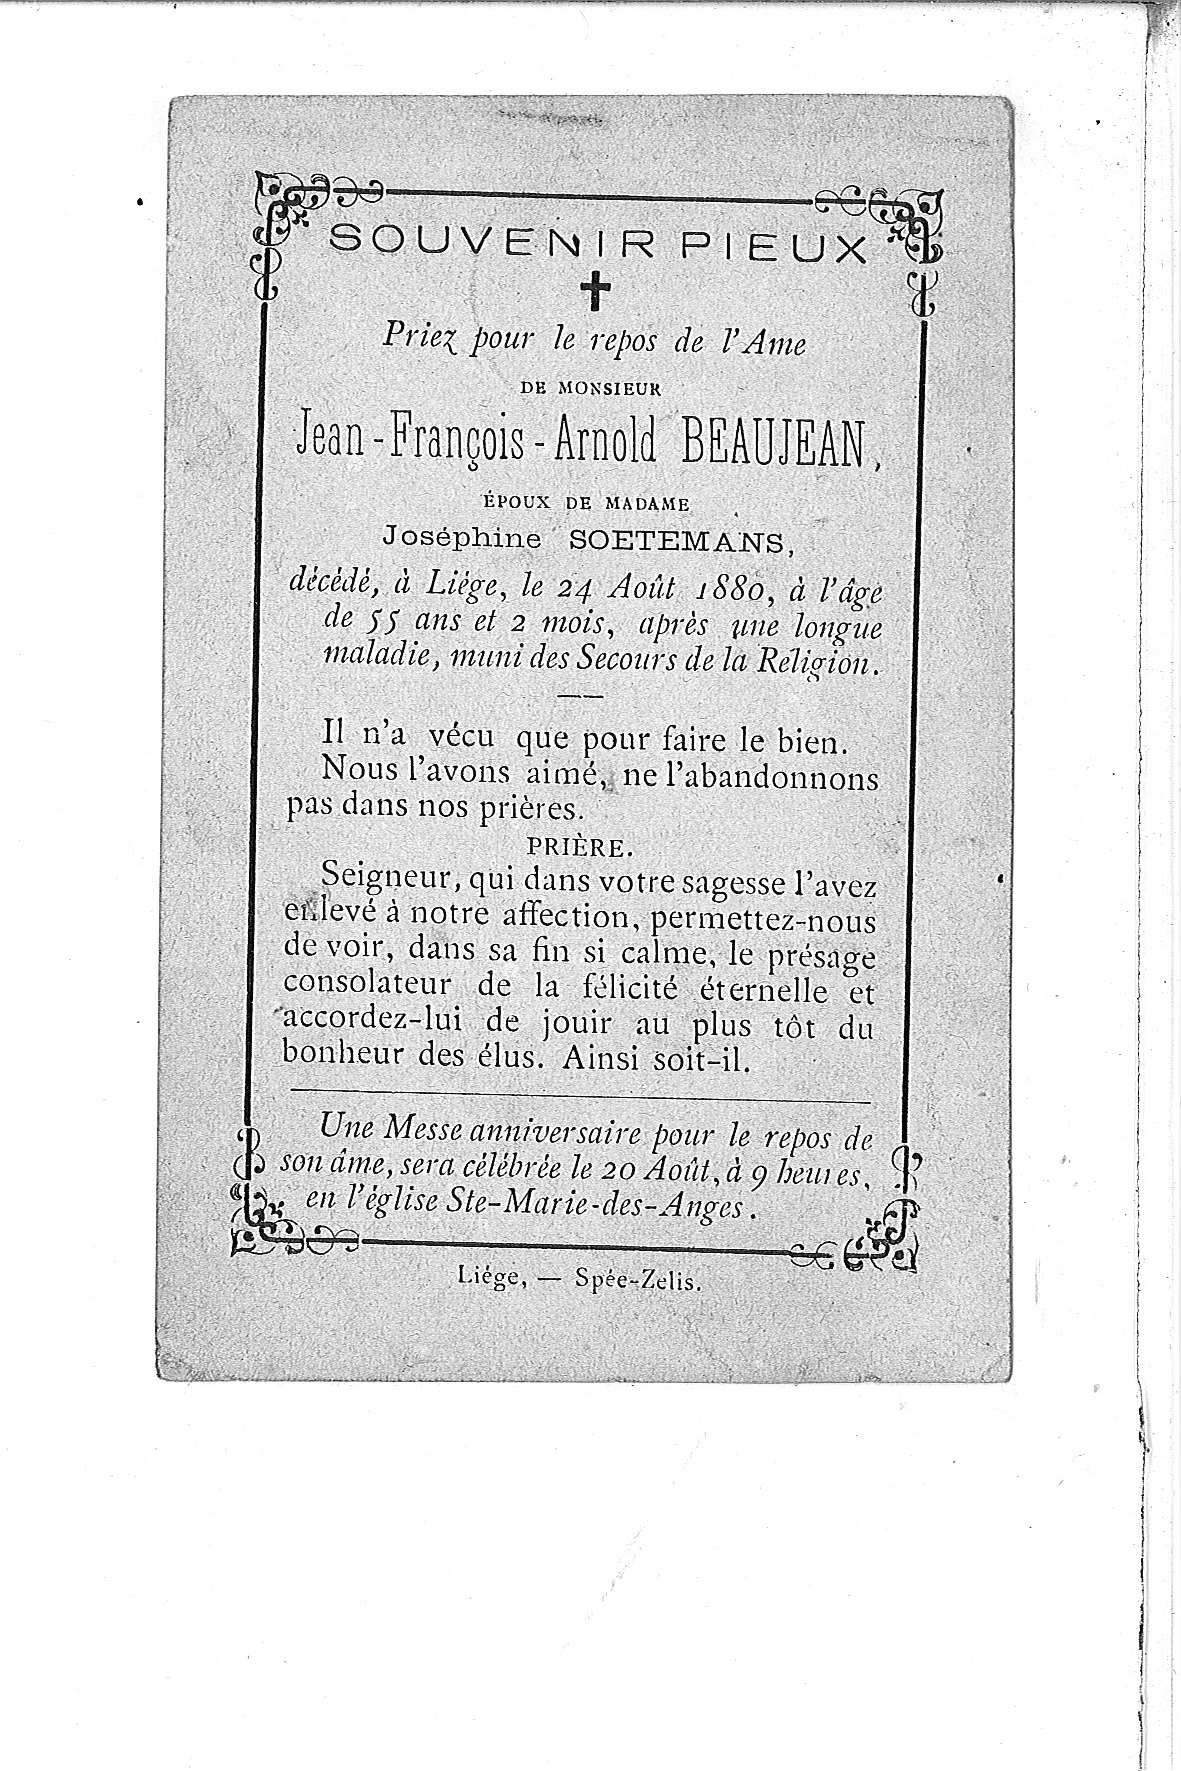 Jean-François-Arnold(1880)20101117115323_00023.jpg